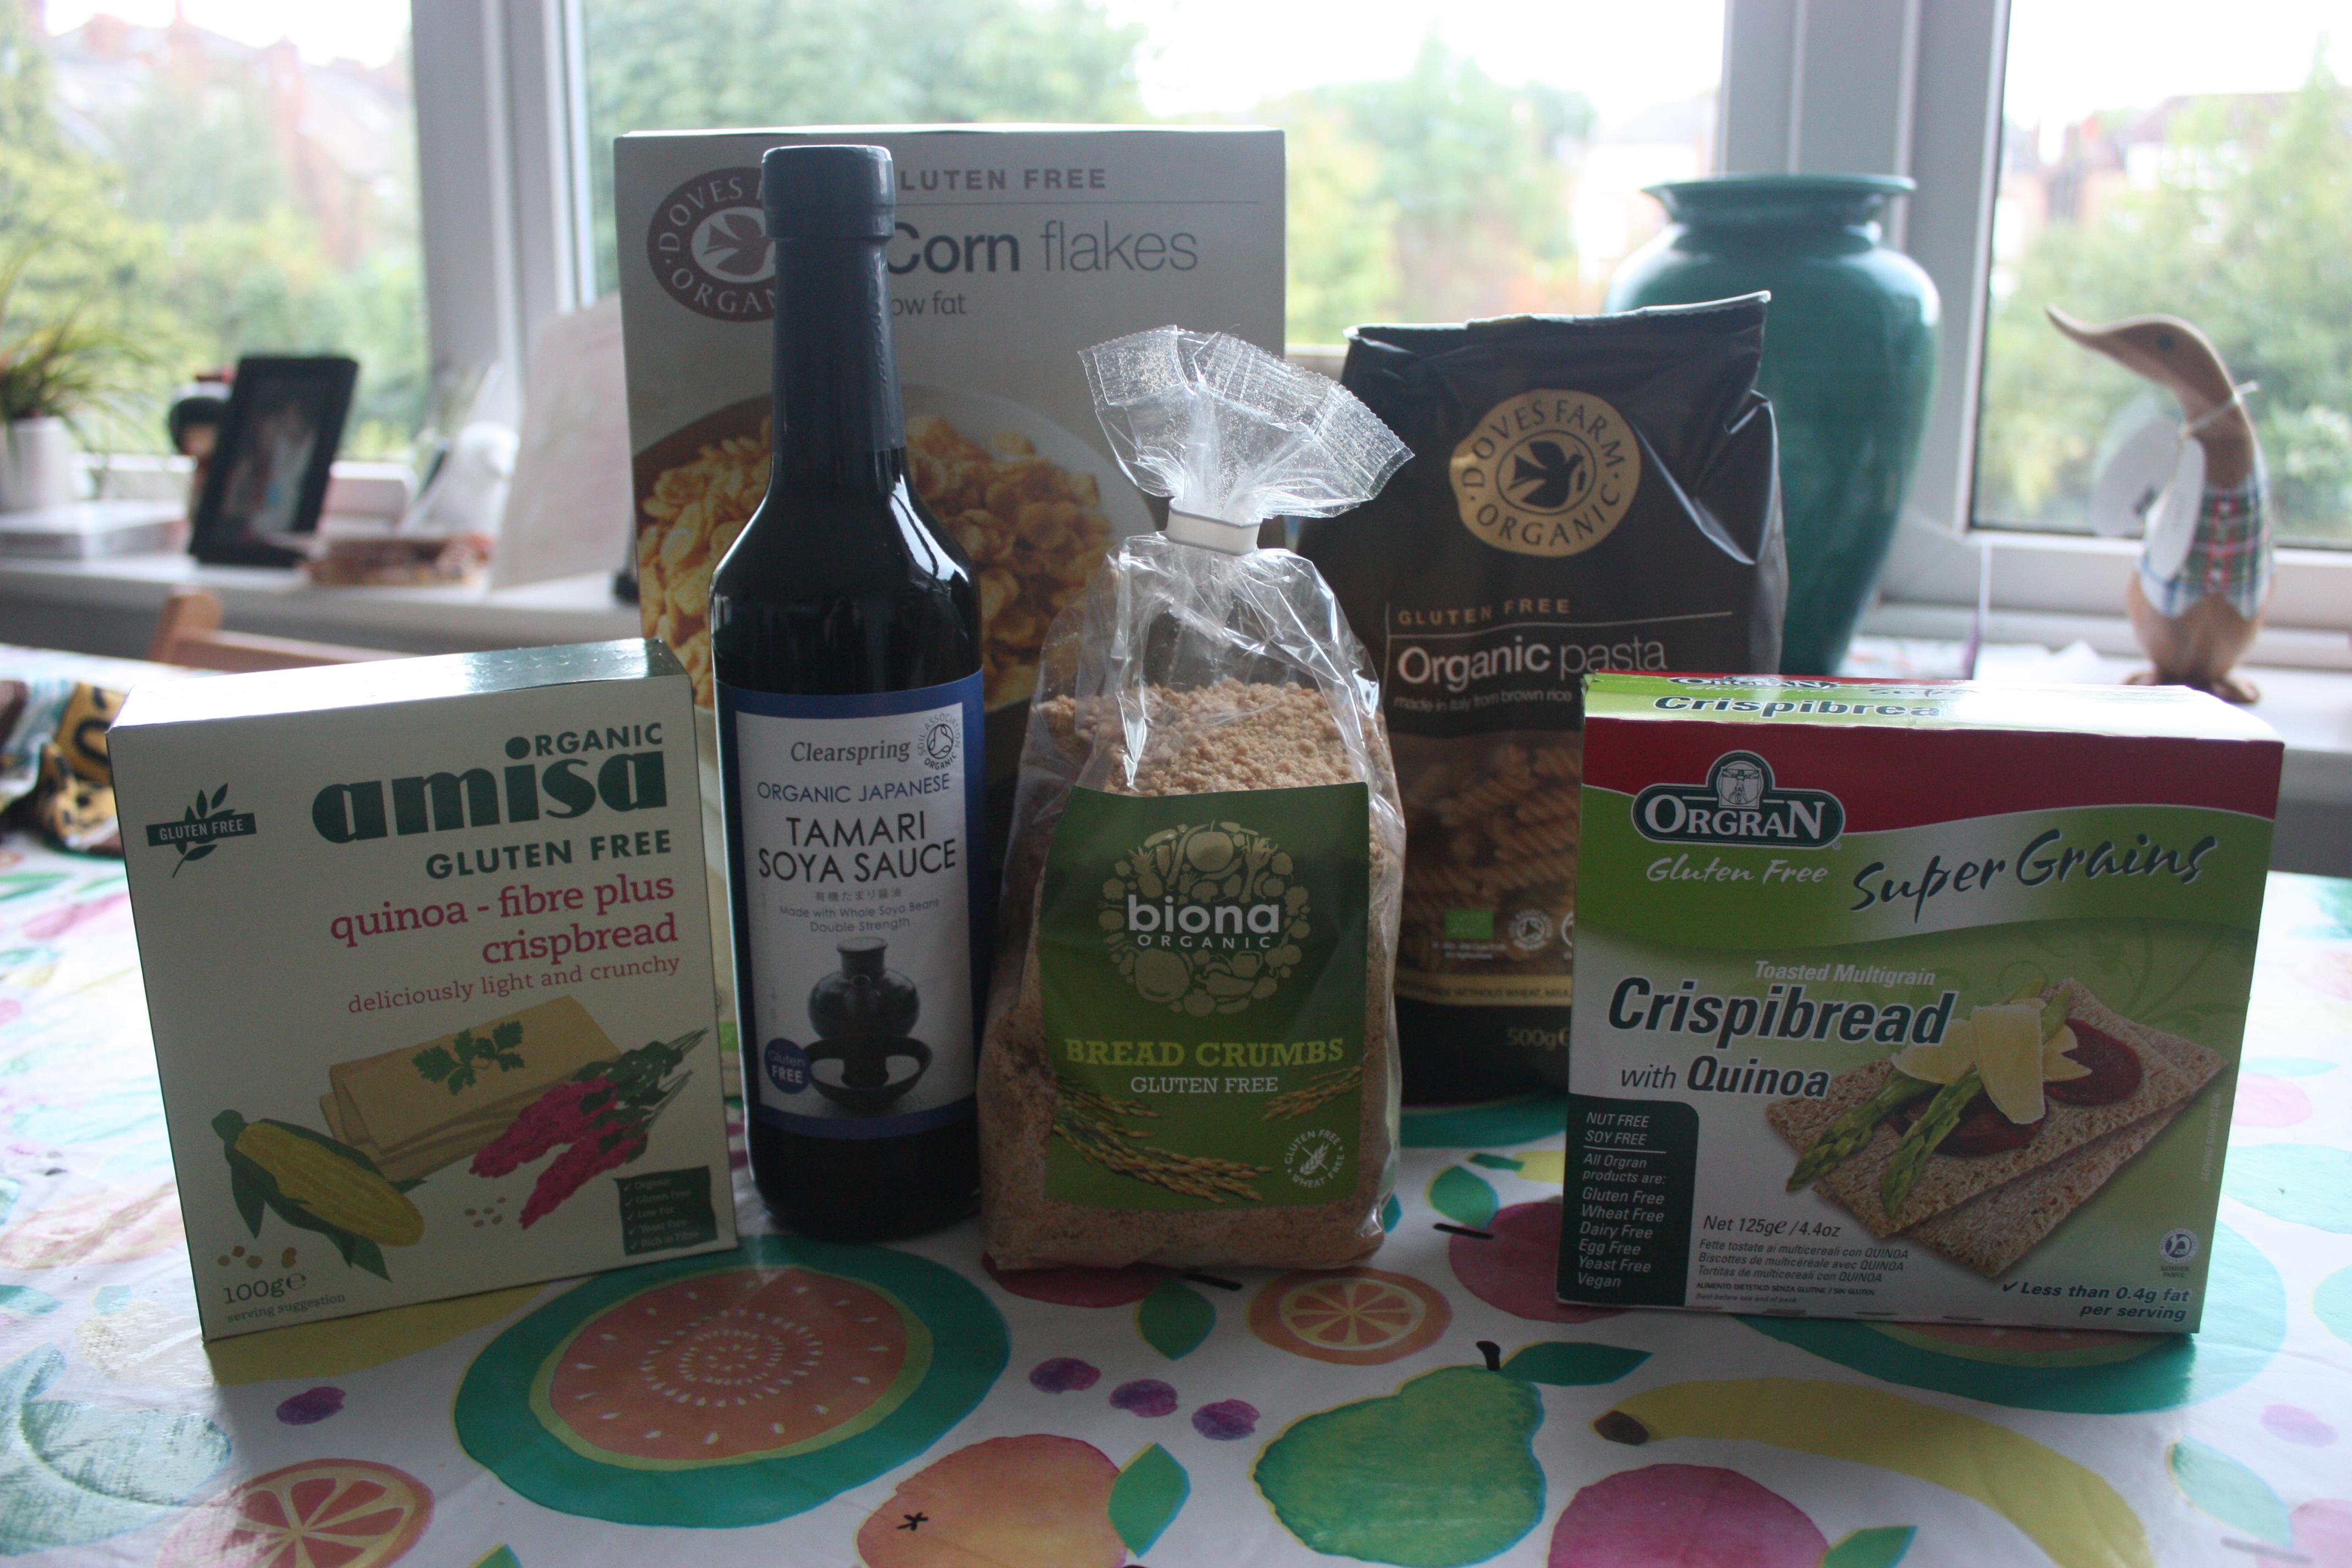 Planet Organic Gluten free haul